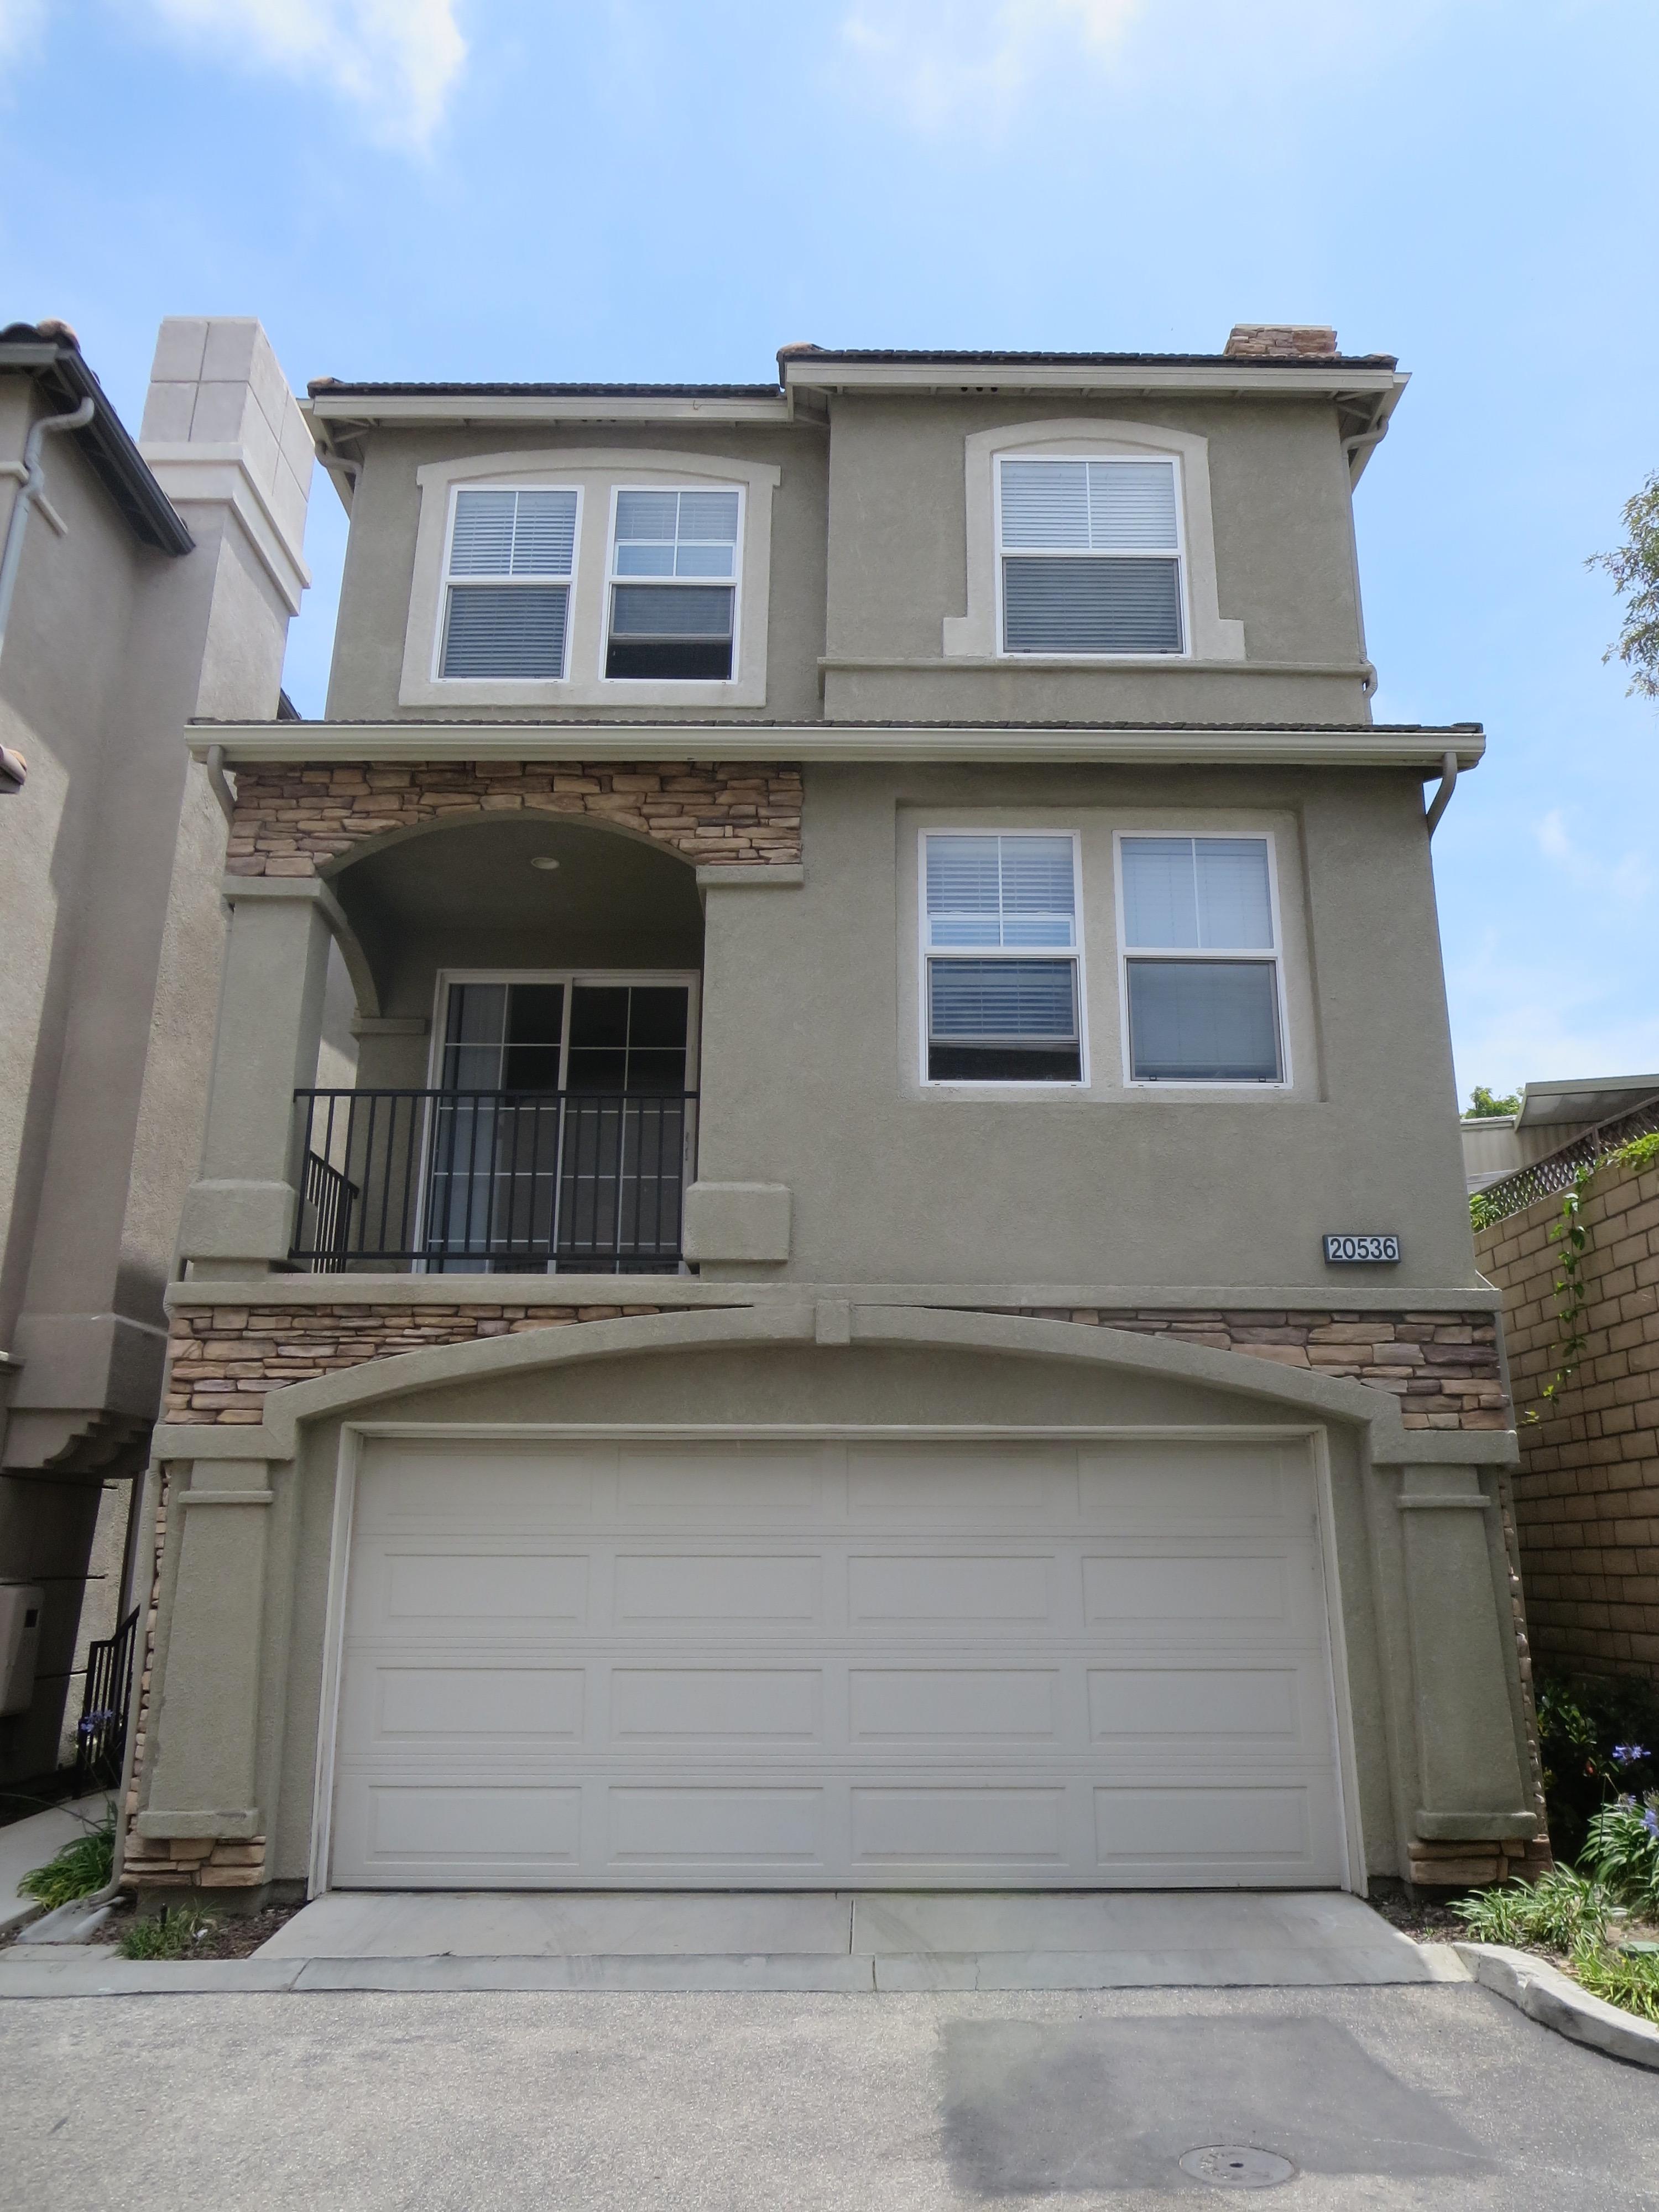 Condominium for Sale at 20536 Earl St Torrance, California, 90503 United States